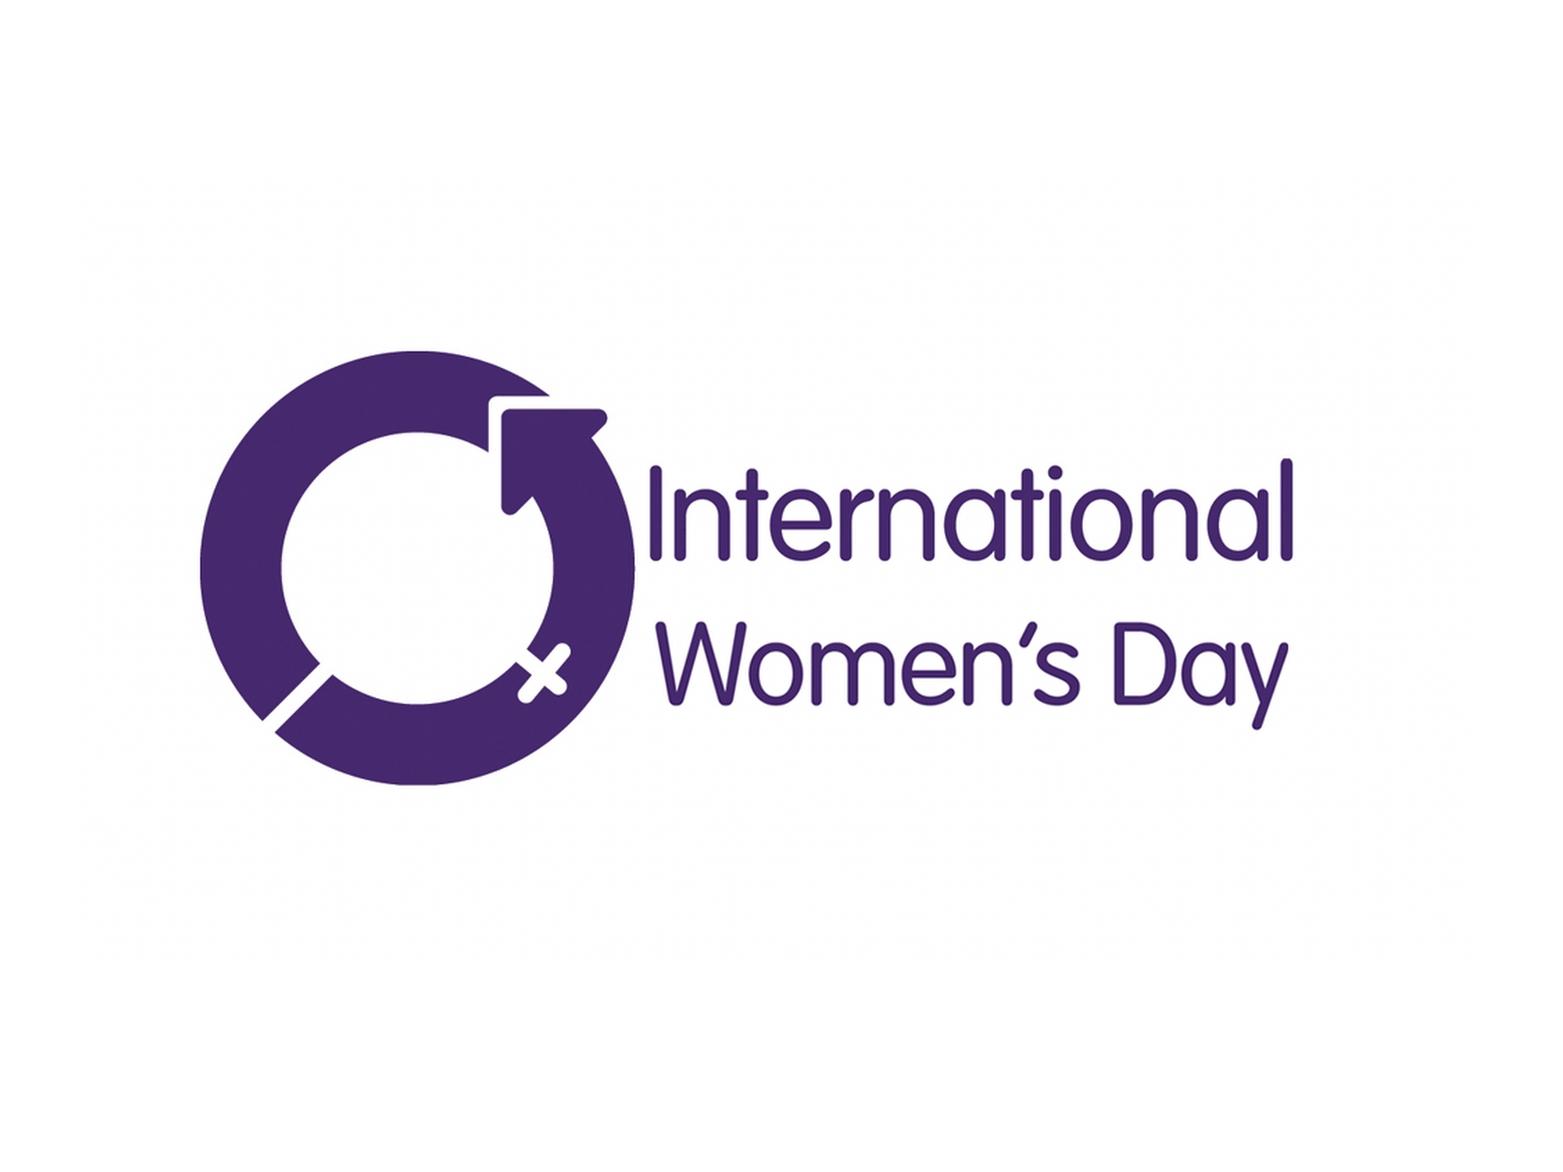 Bringing the Balance, Women in Politics, Lib Dem diversity team event for IWD, 7 March, London